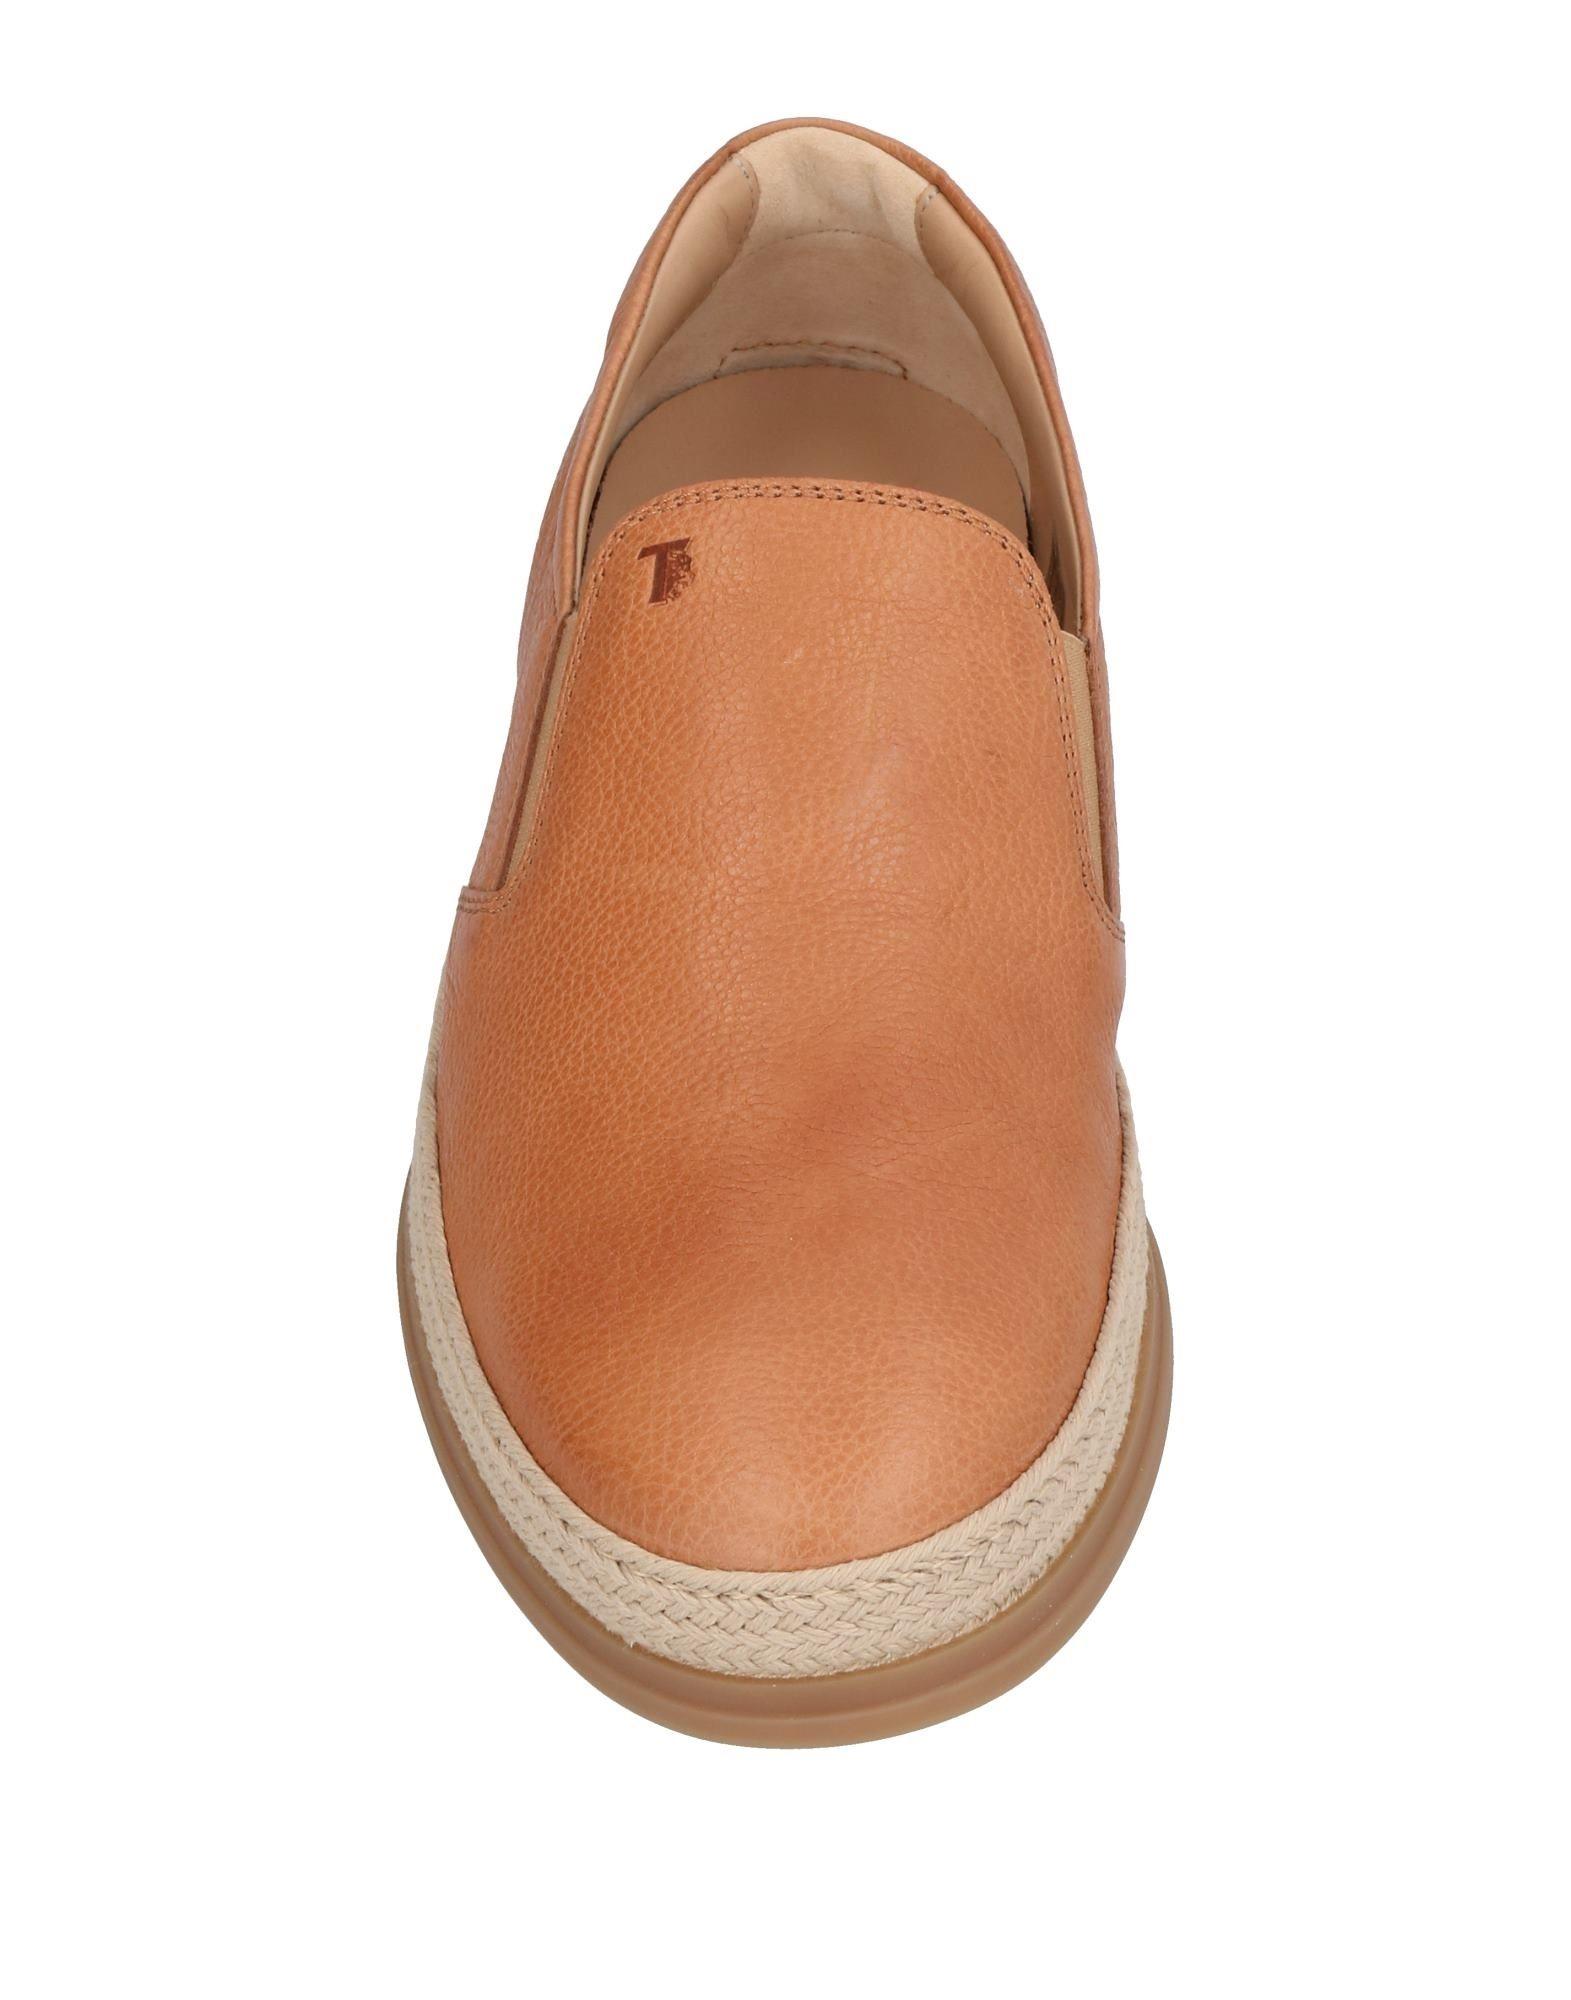 Tod's Sneakers Herren  11397773GL Schuhe Gute Qualität beliebte Schuhe 11397773GL 7ec1ef